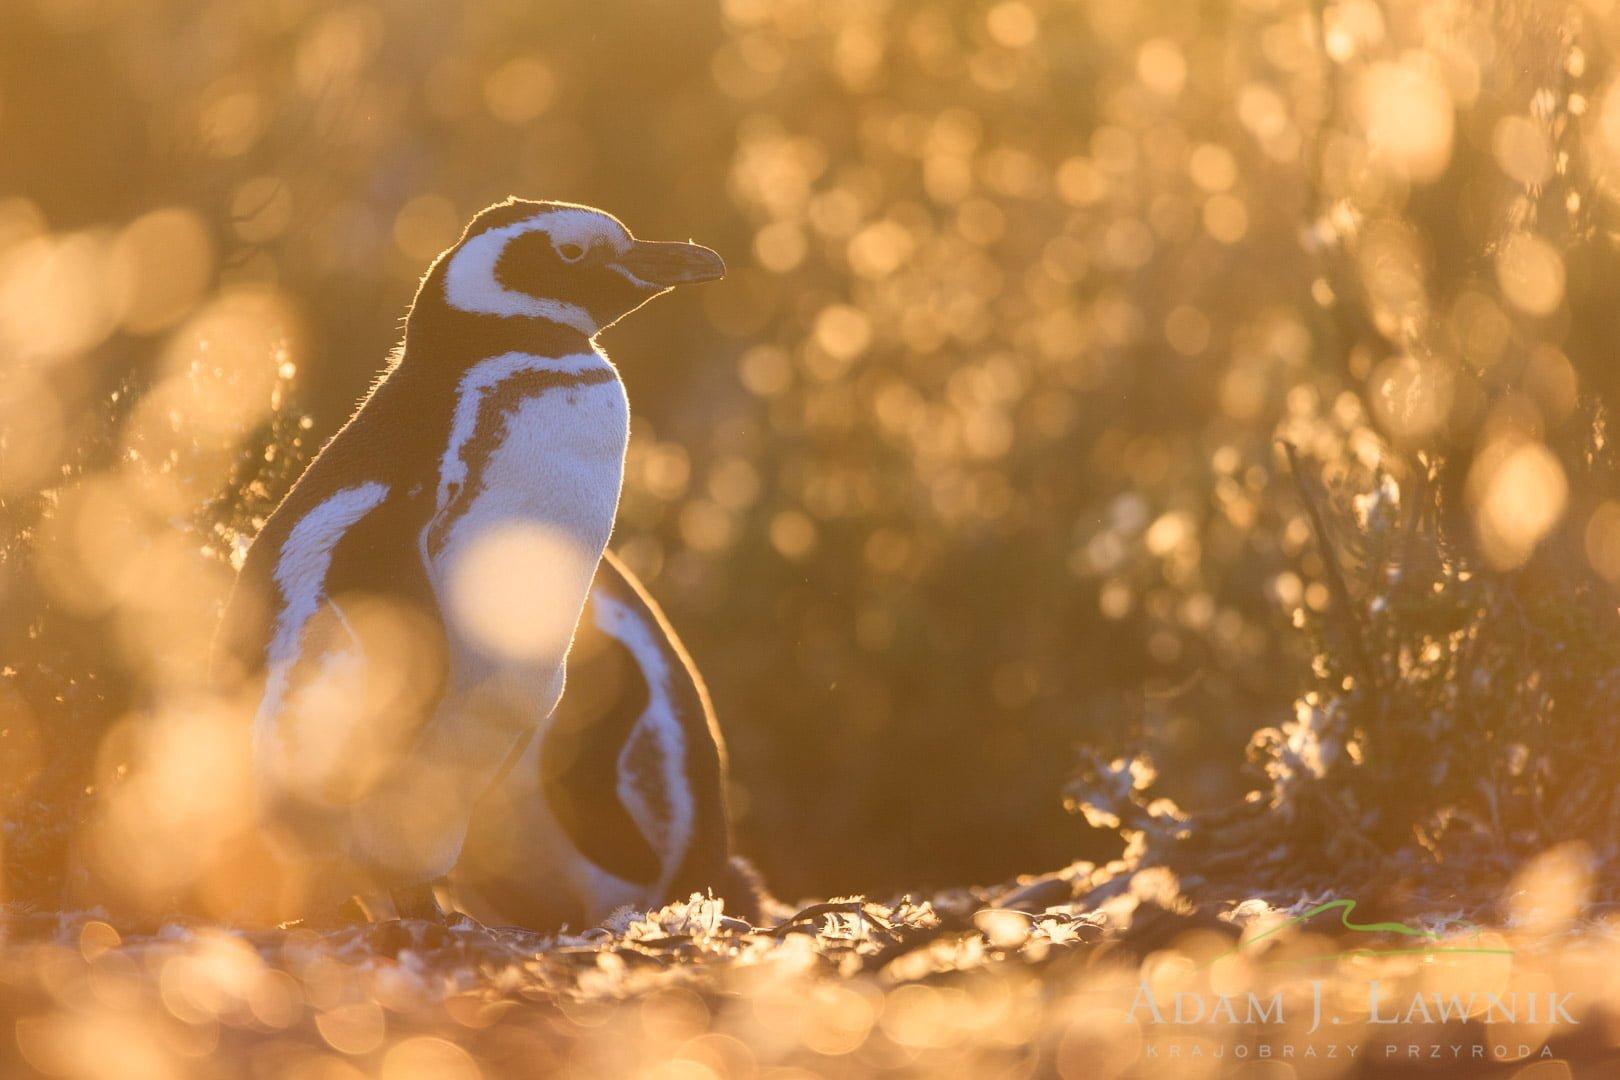 Penguins 1204-01167C